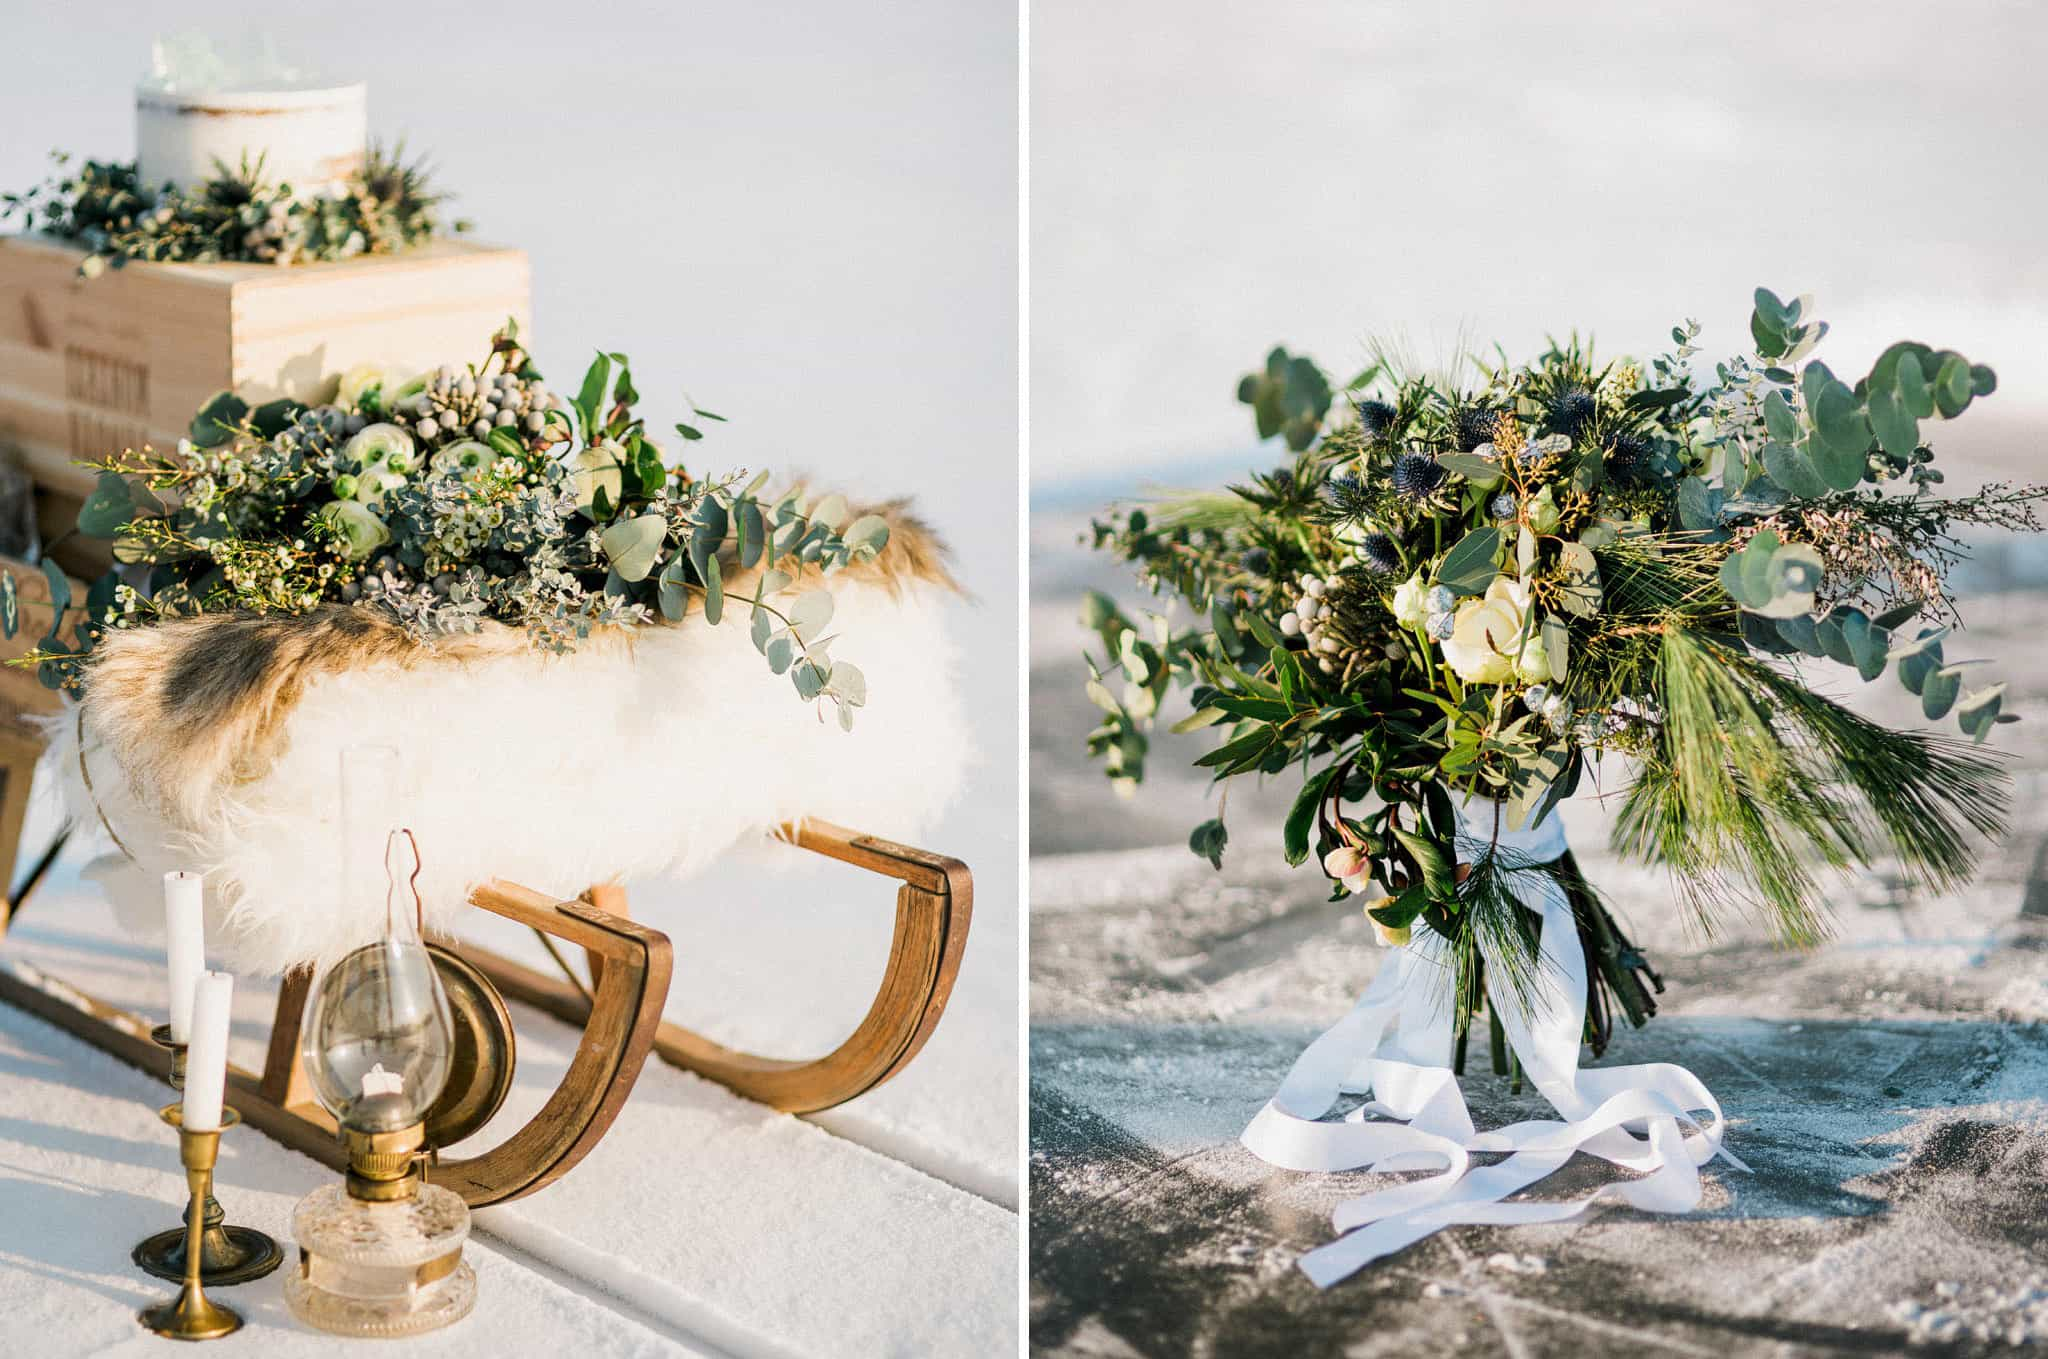 09_wedoverhills_elopement_inspiration_sledge_bouquet